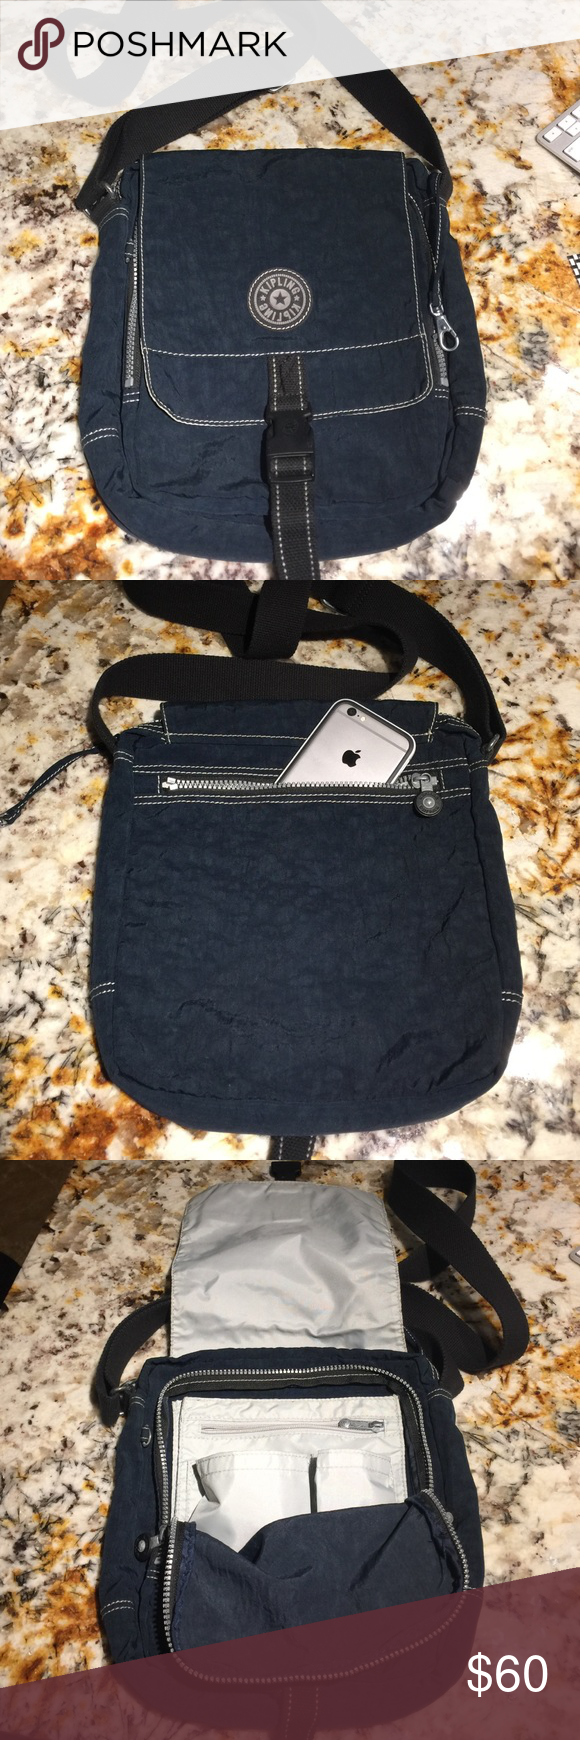 Kipling messenger crossbody bag Very nice & neat Kipling crossbody messenger bag navy blue looks like new ! Kipling Bags Crossbody Bags